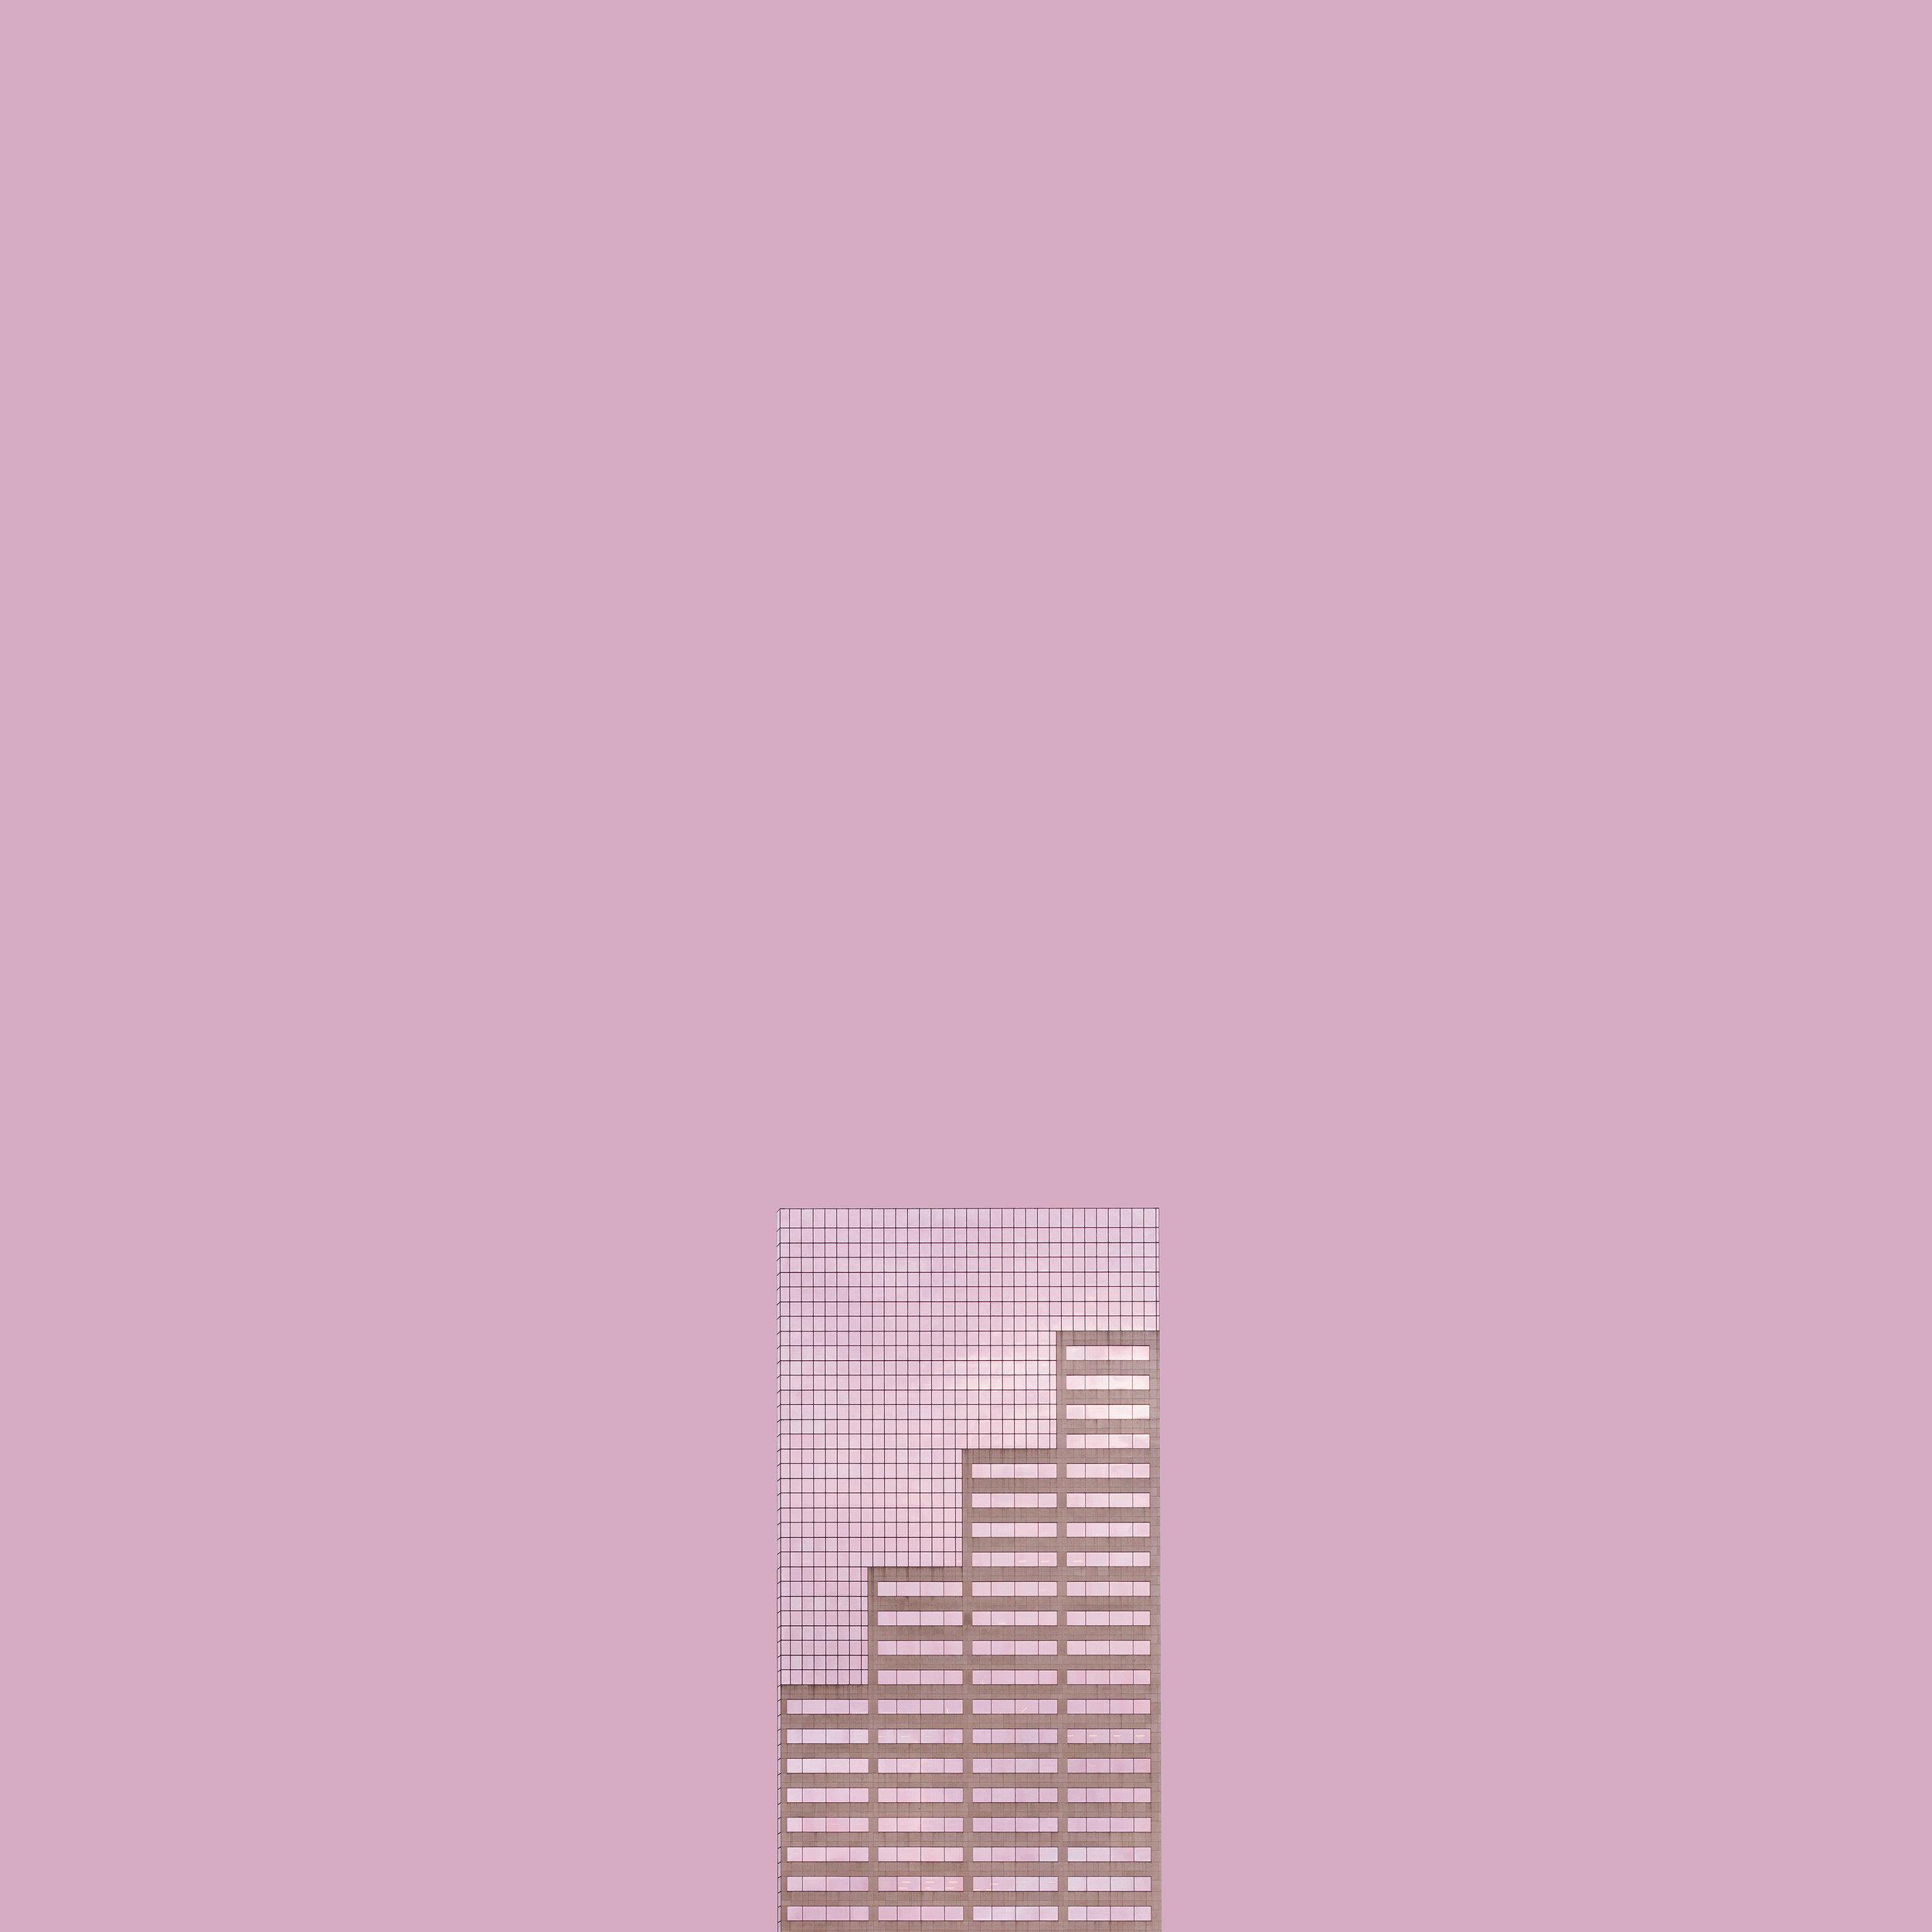 Niv Rozenberg - Big Pink Building - 12x12 Inches.jpg